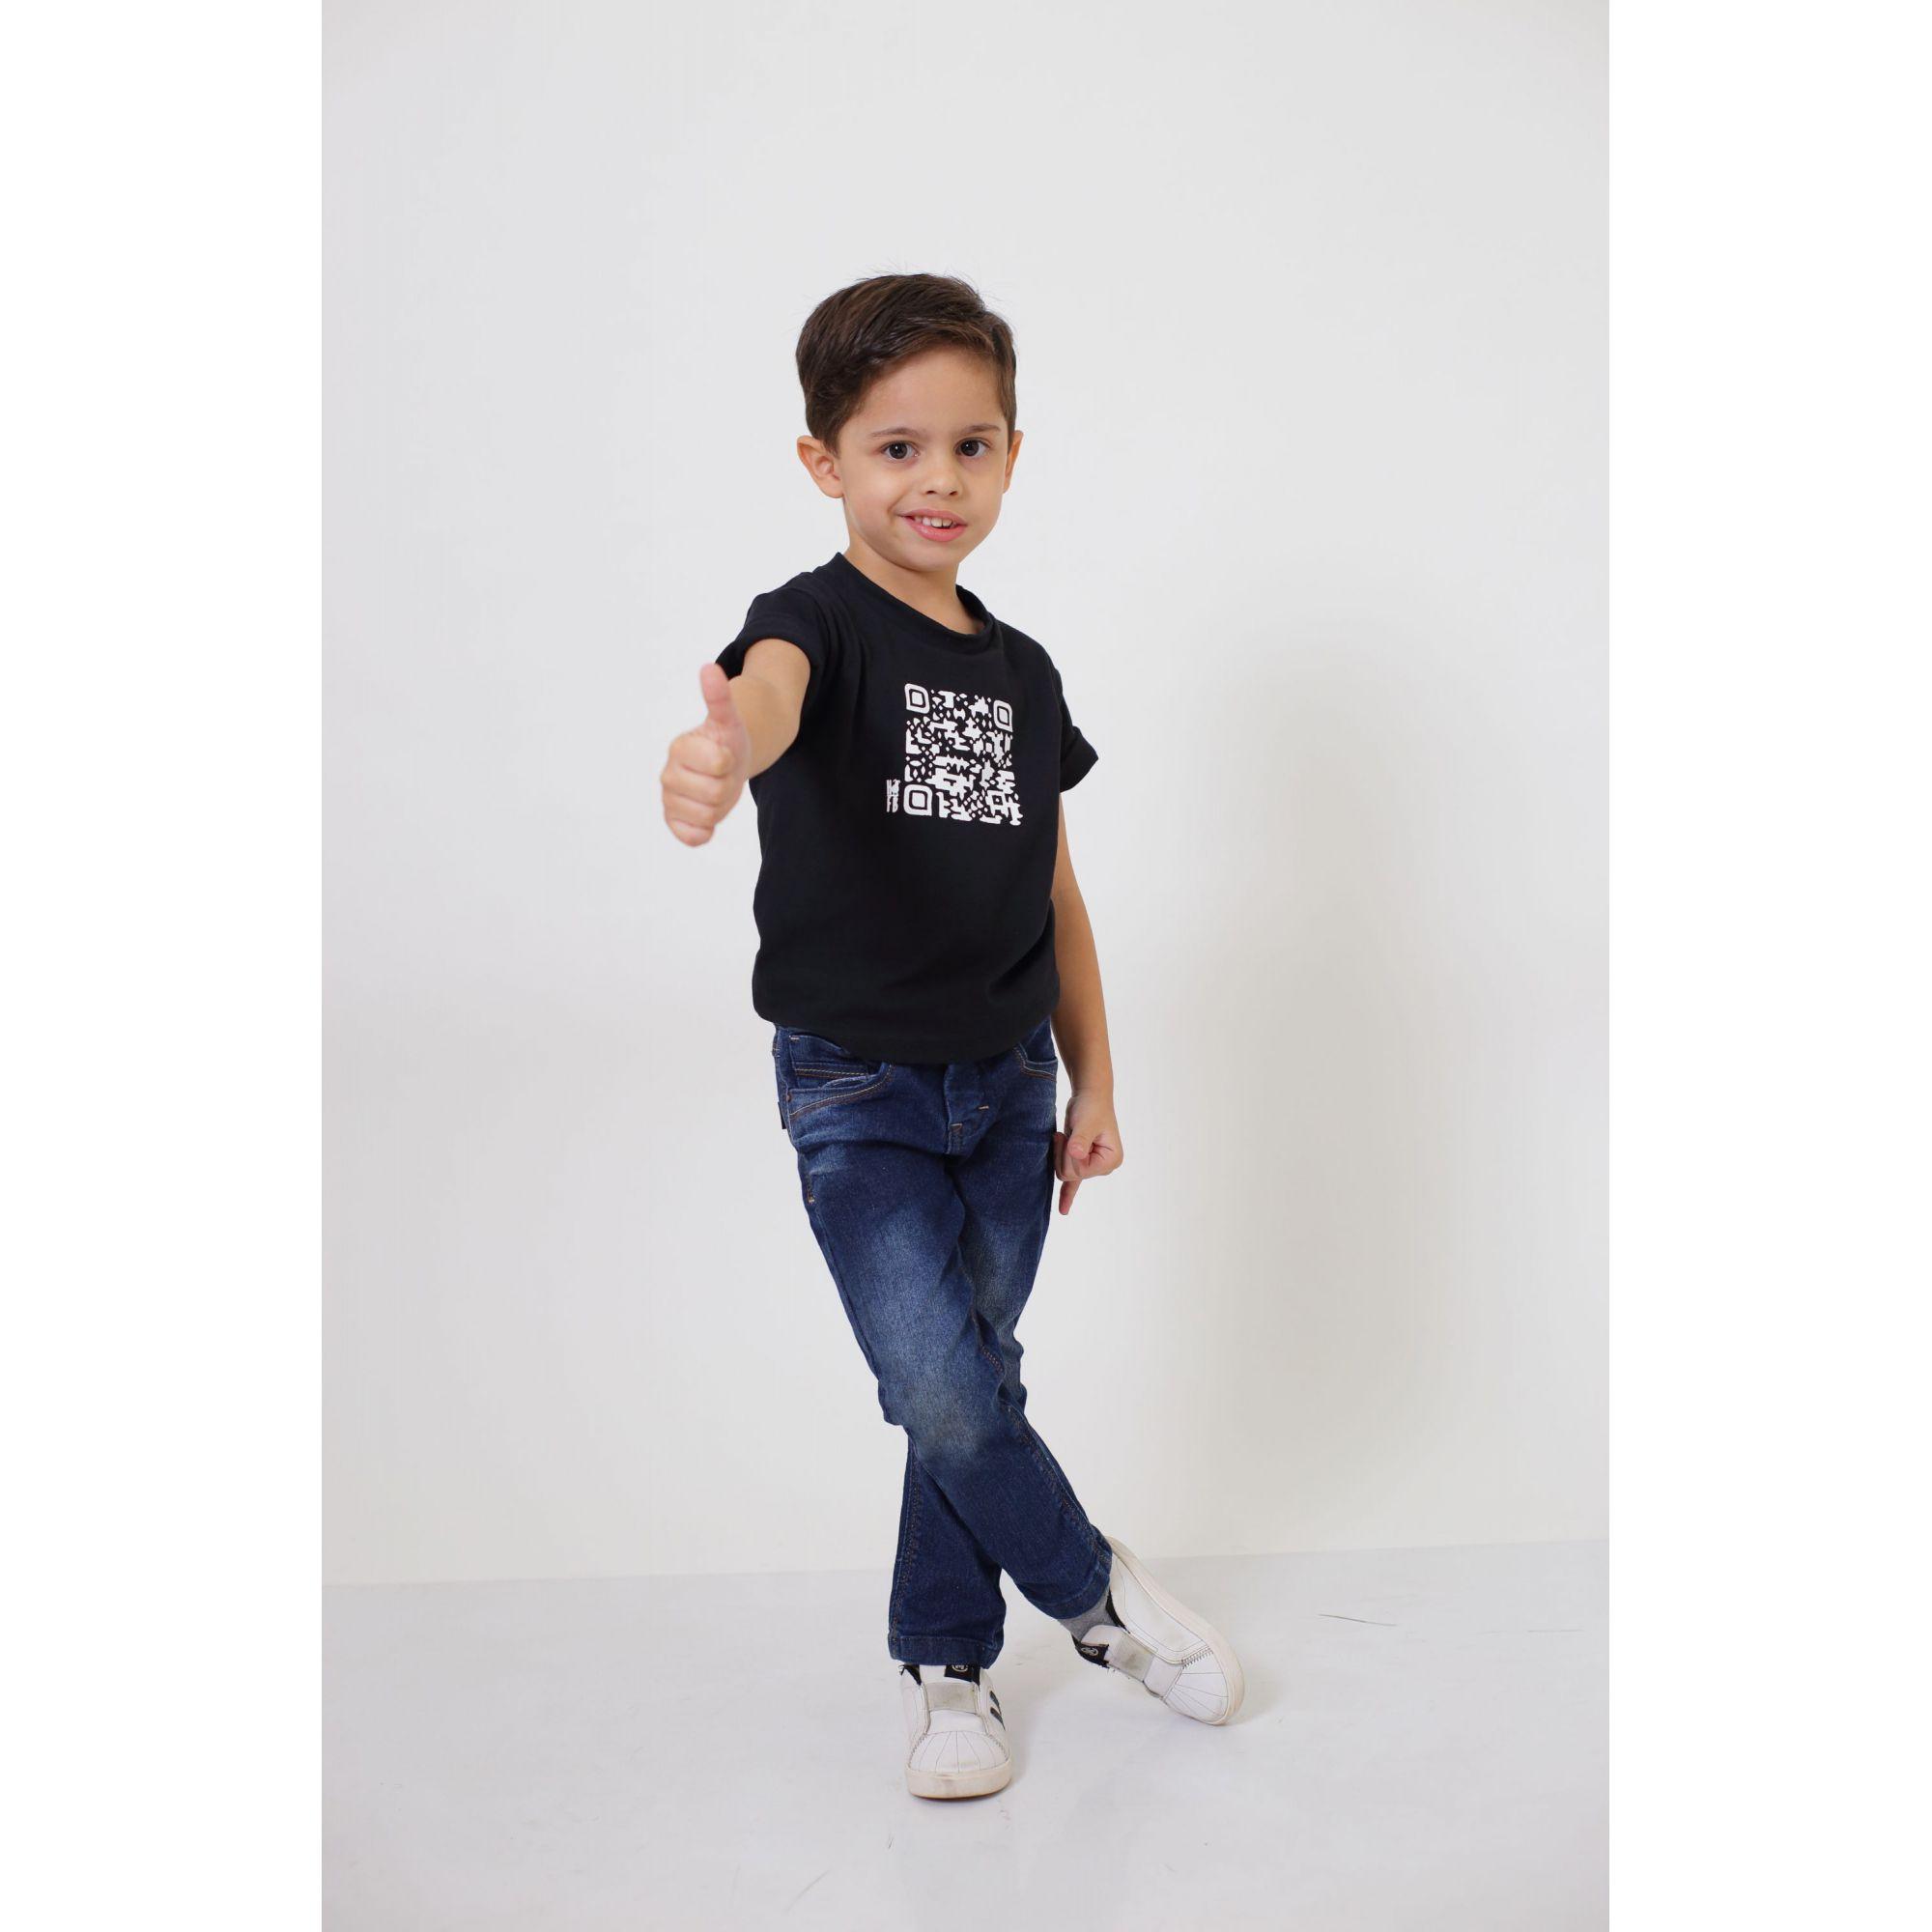 Camiseta ou Body Infantil Unissex - QRCODE  - Heitor Fashion Brazil